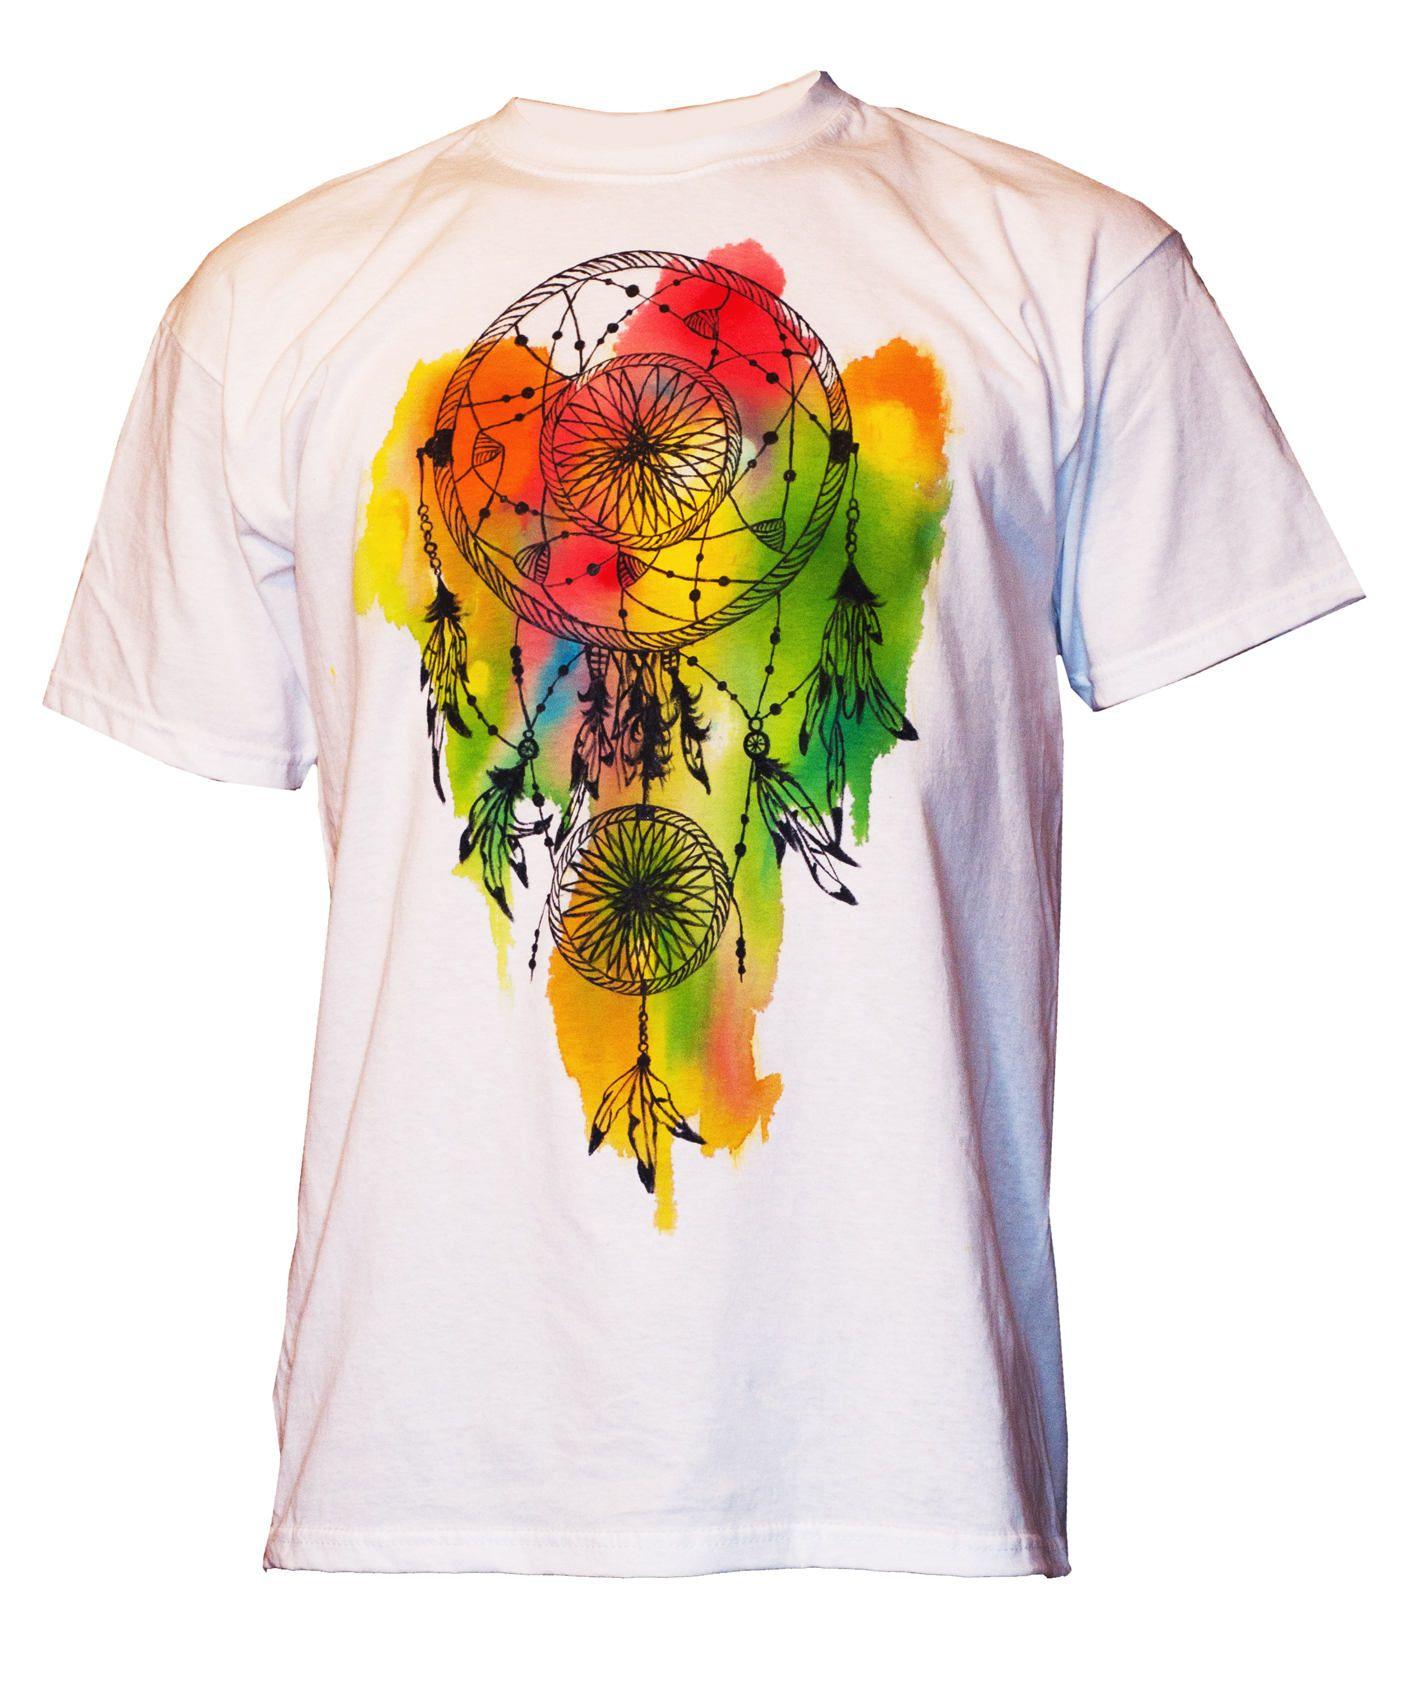 Women S Short Sleeve Summer T Shirt Top Sizes M To 3xl White